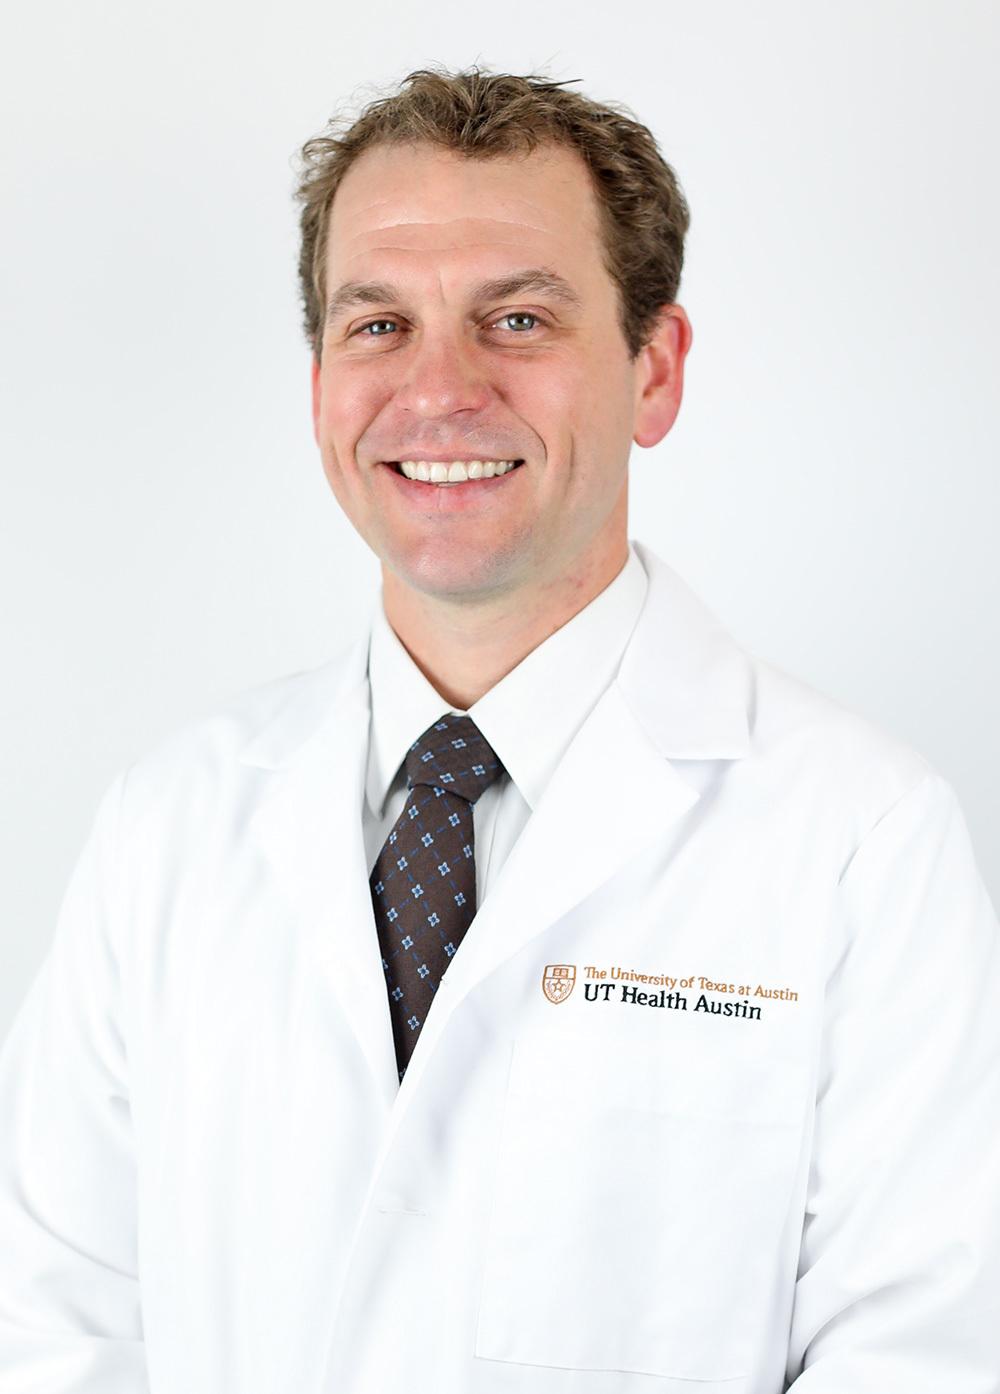 Garrett Key at UT Health Austin